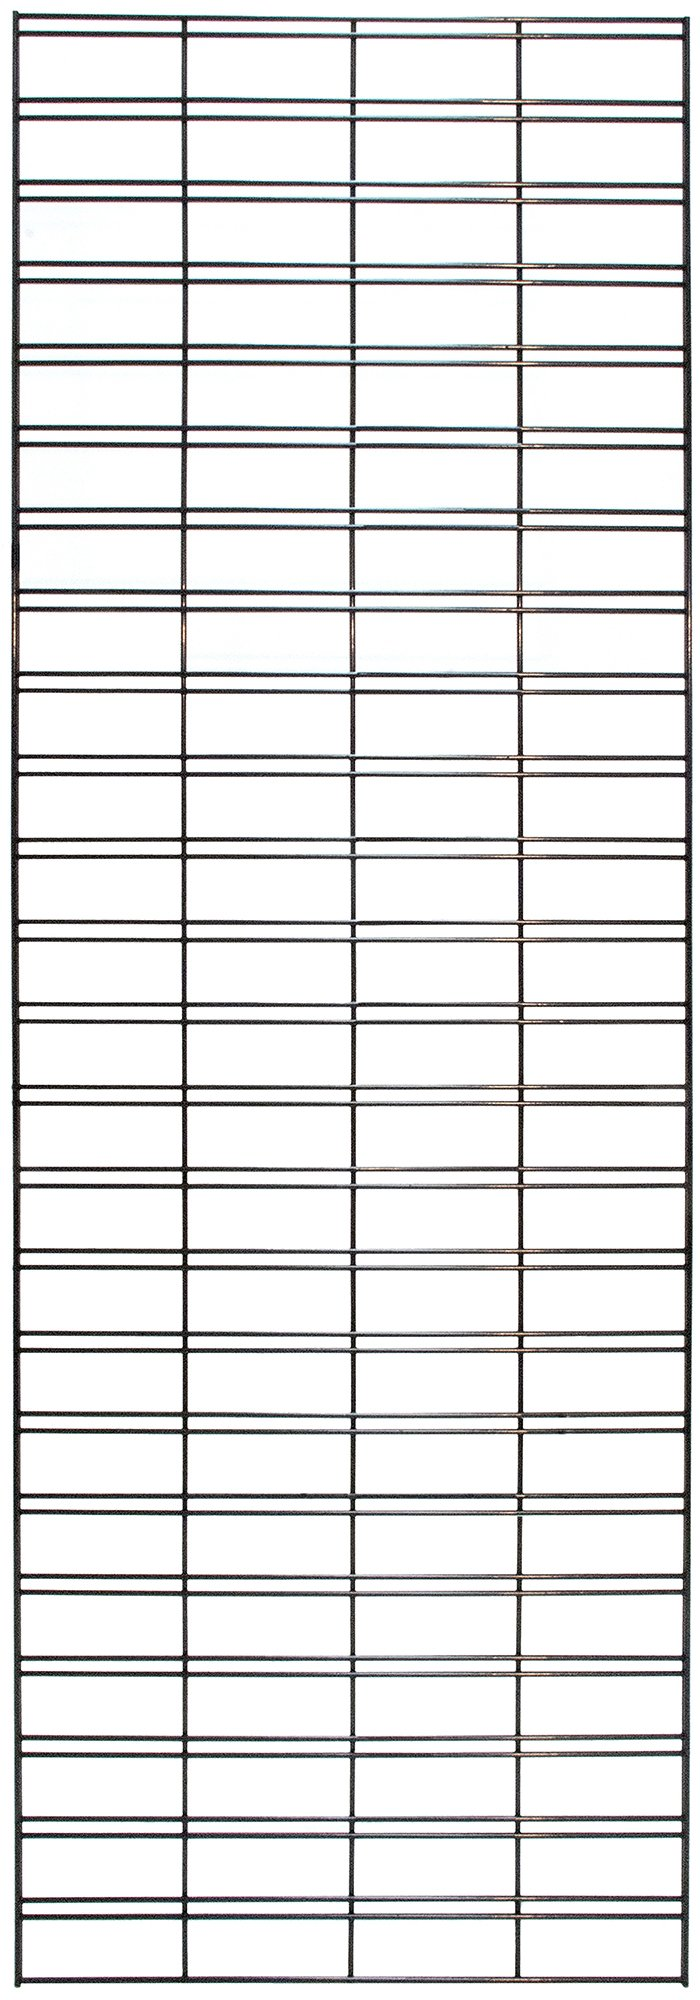 KC Store Fixtures A04253 Slatgrid Panel, 2' x 6', Black (Pack of 3)